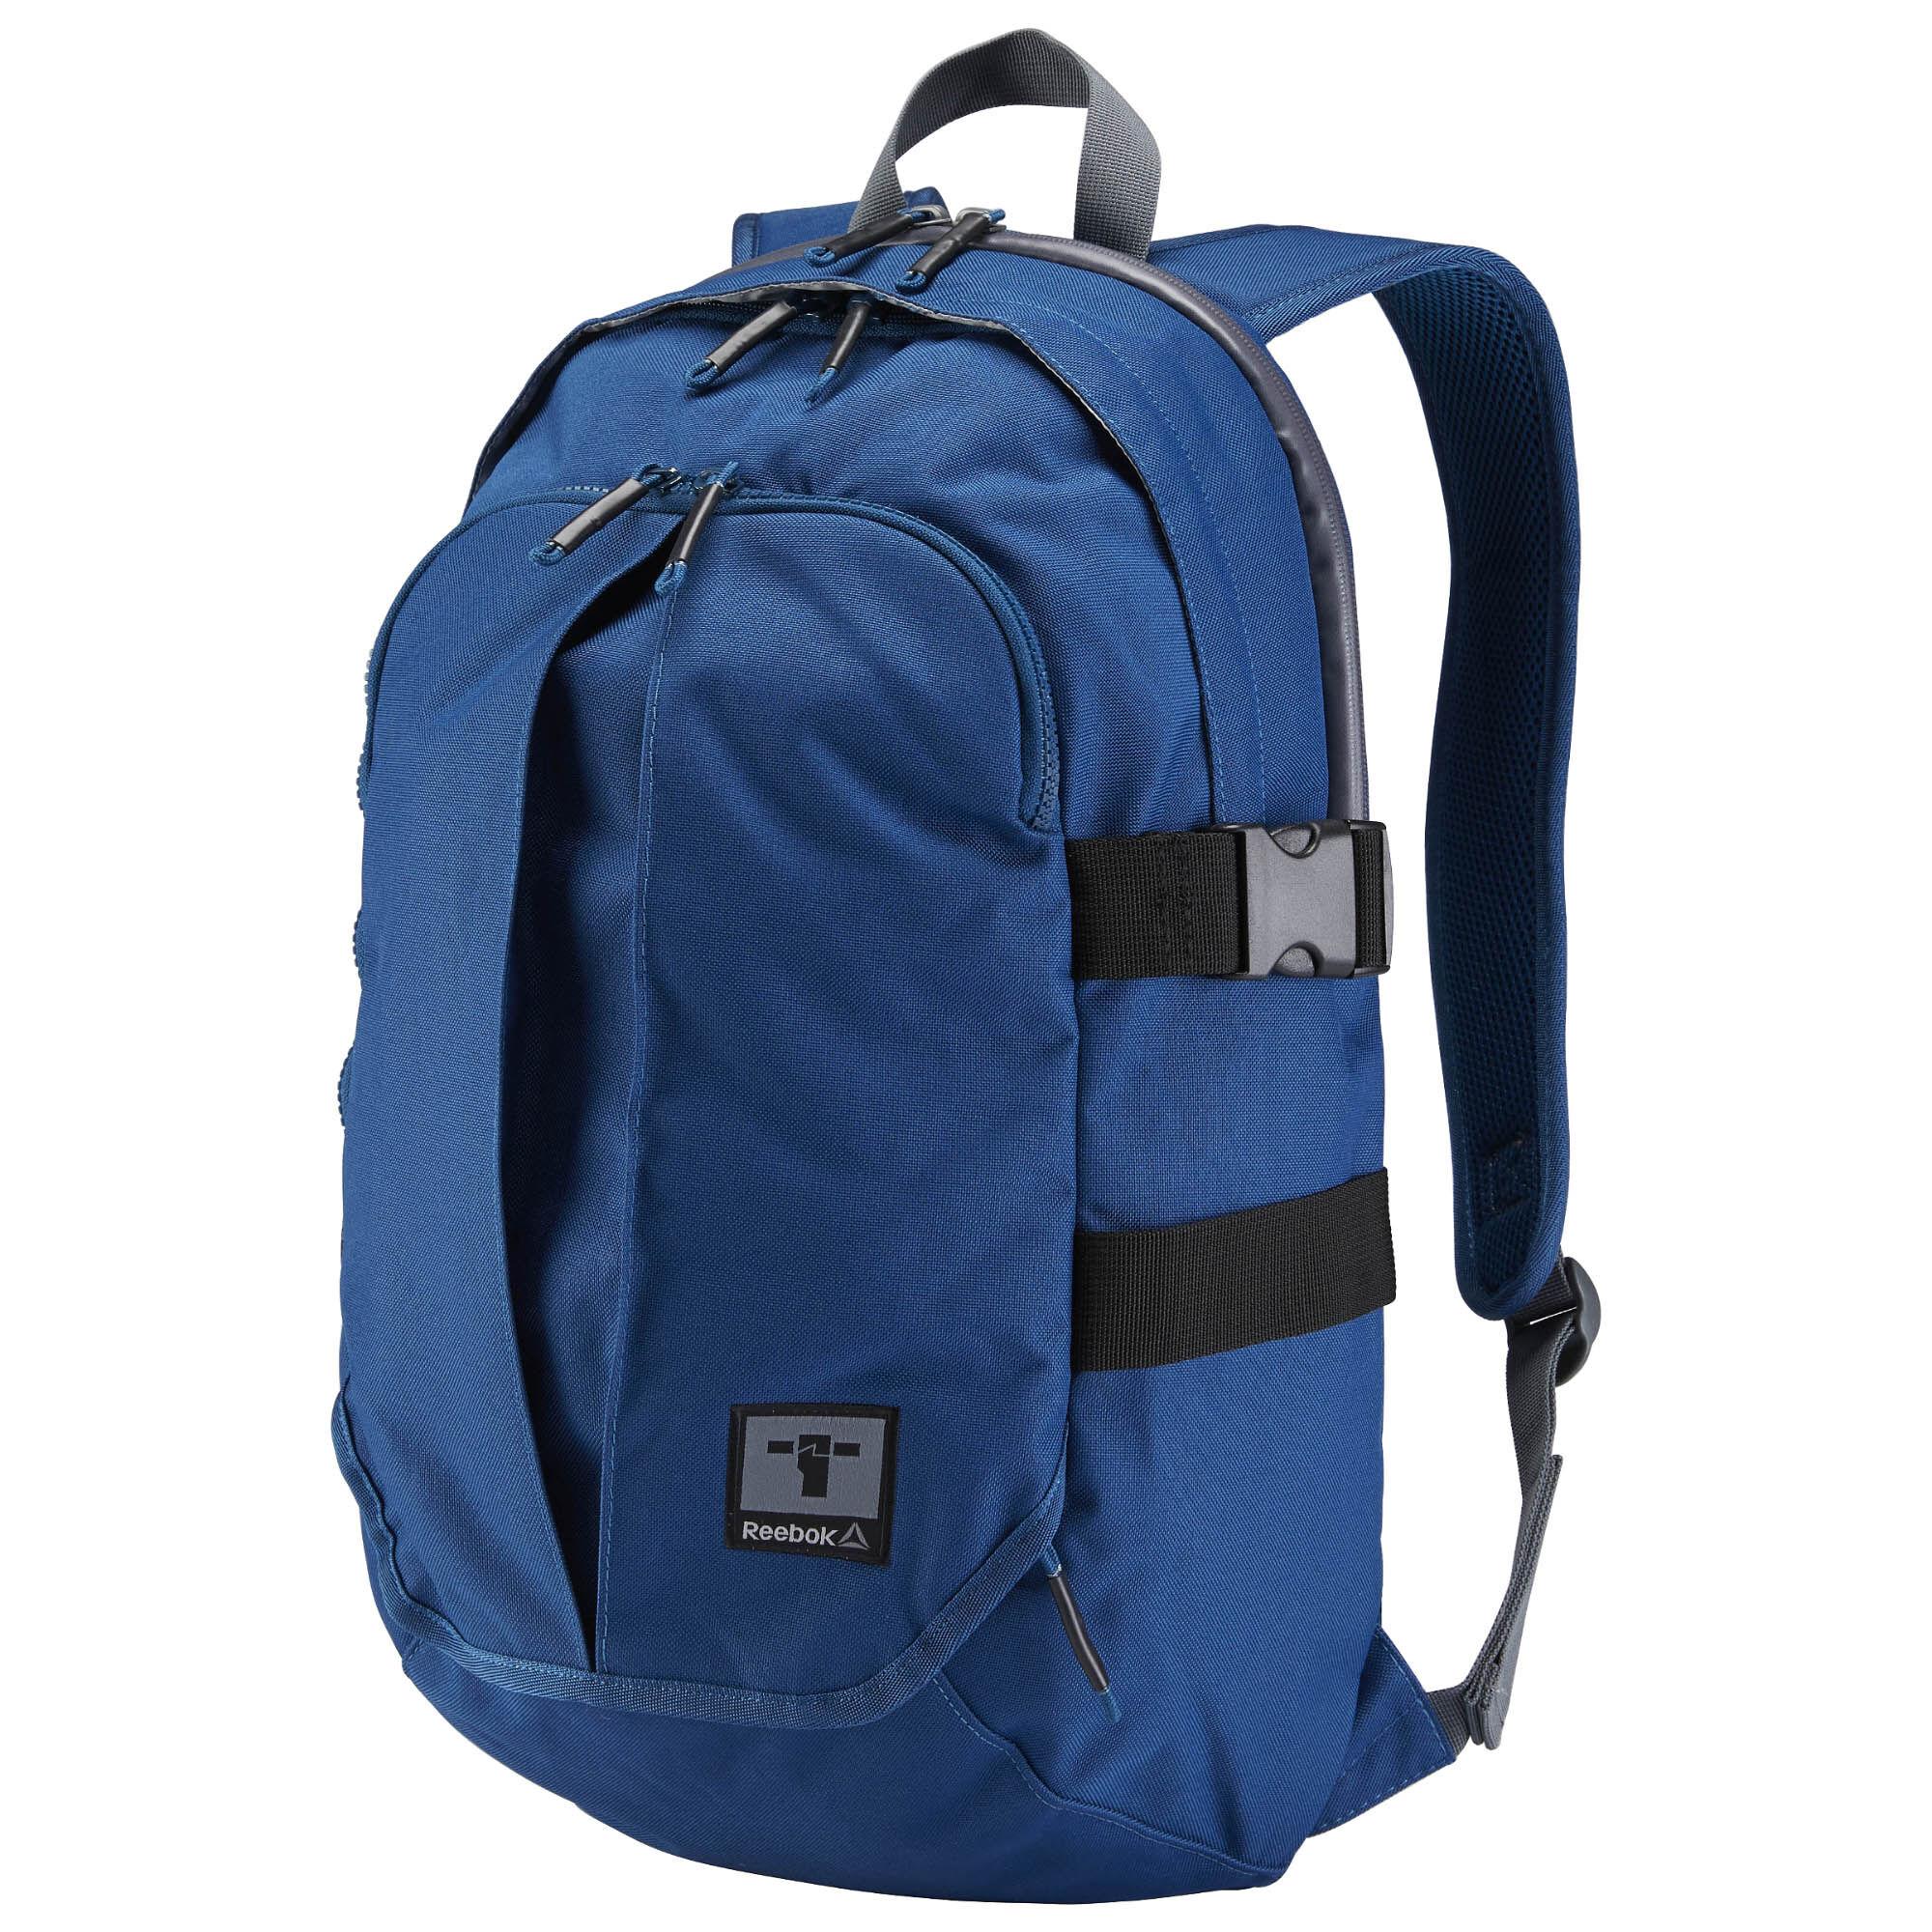 reebok spartan backpack Sale 5439a9f2ad6